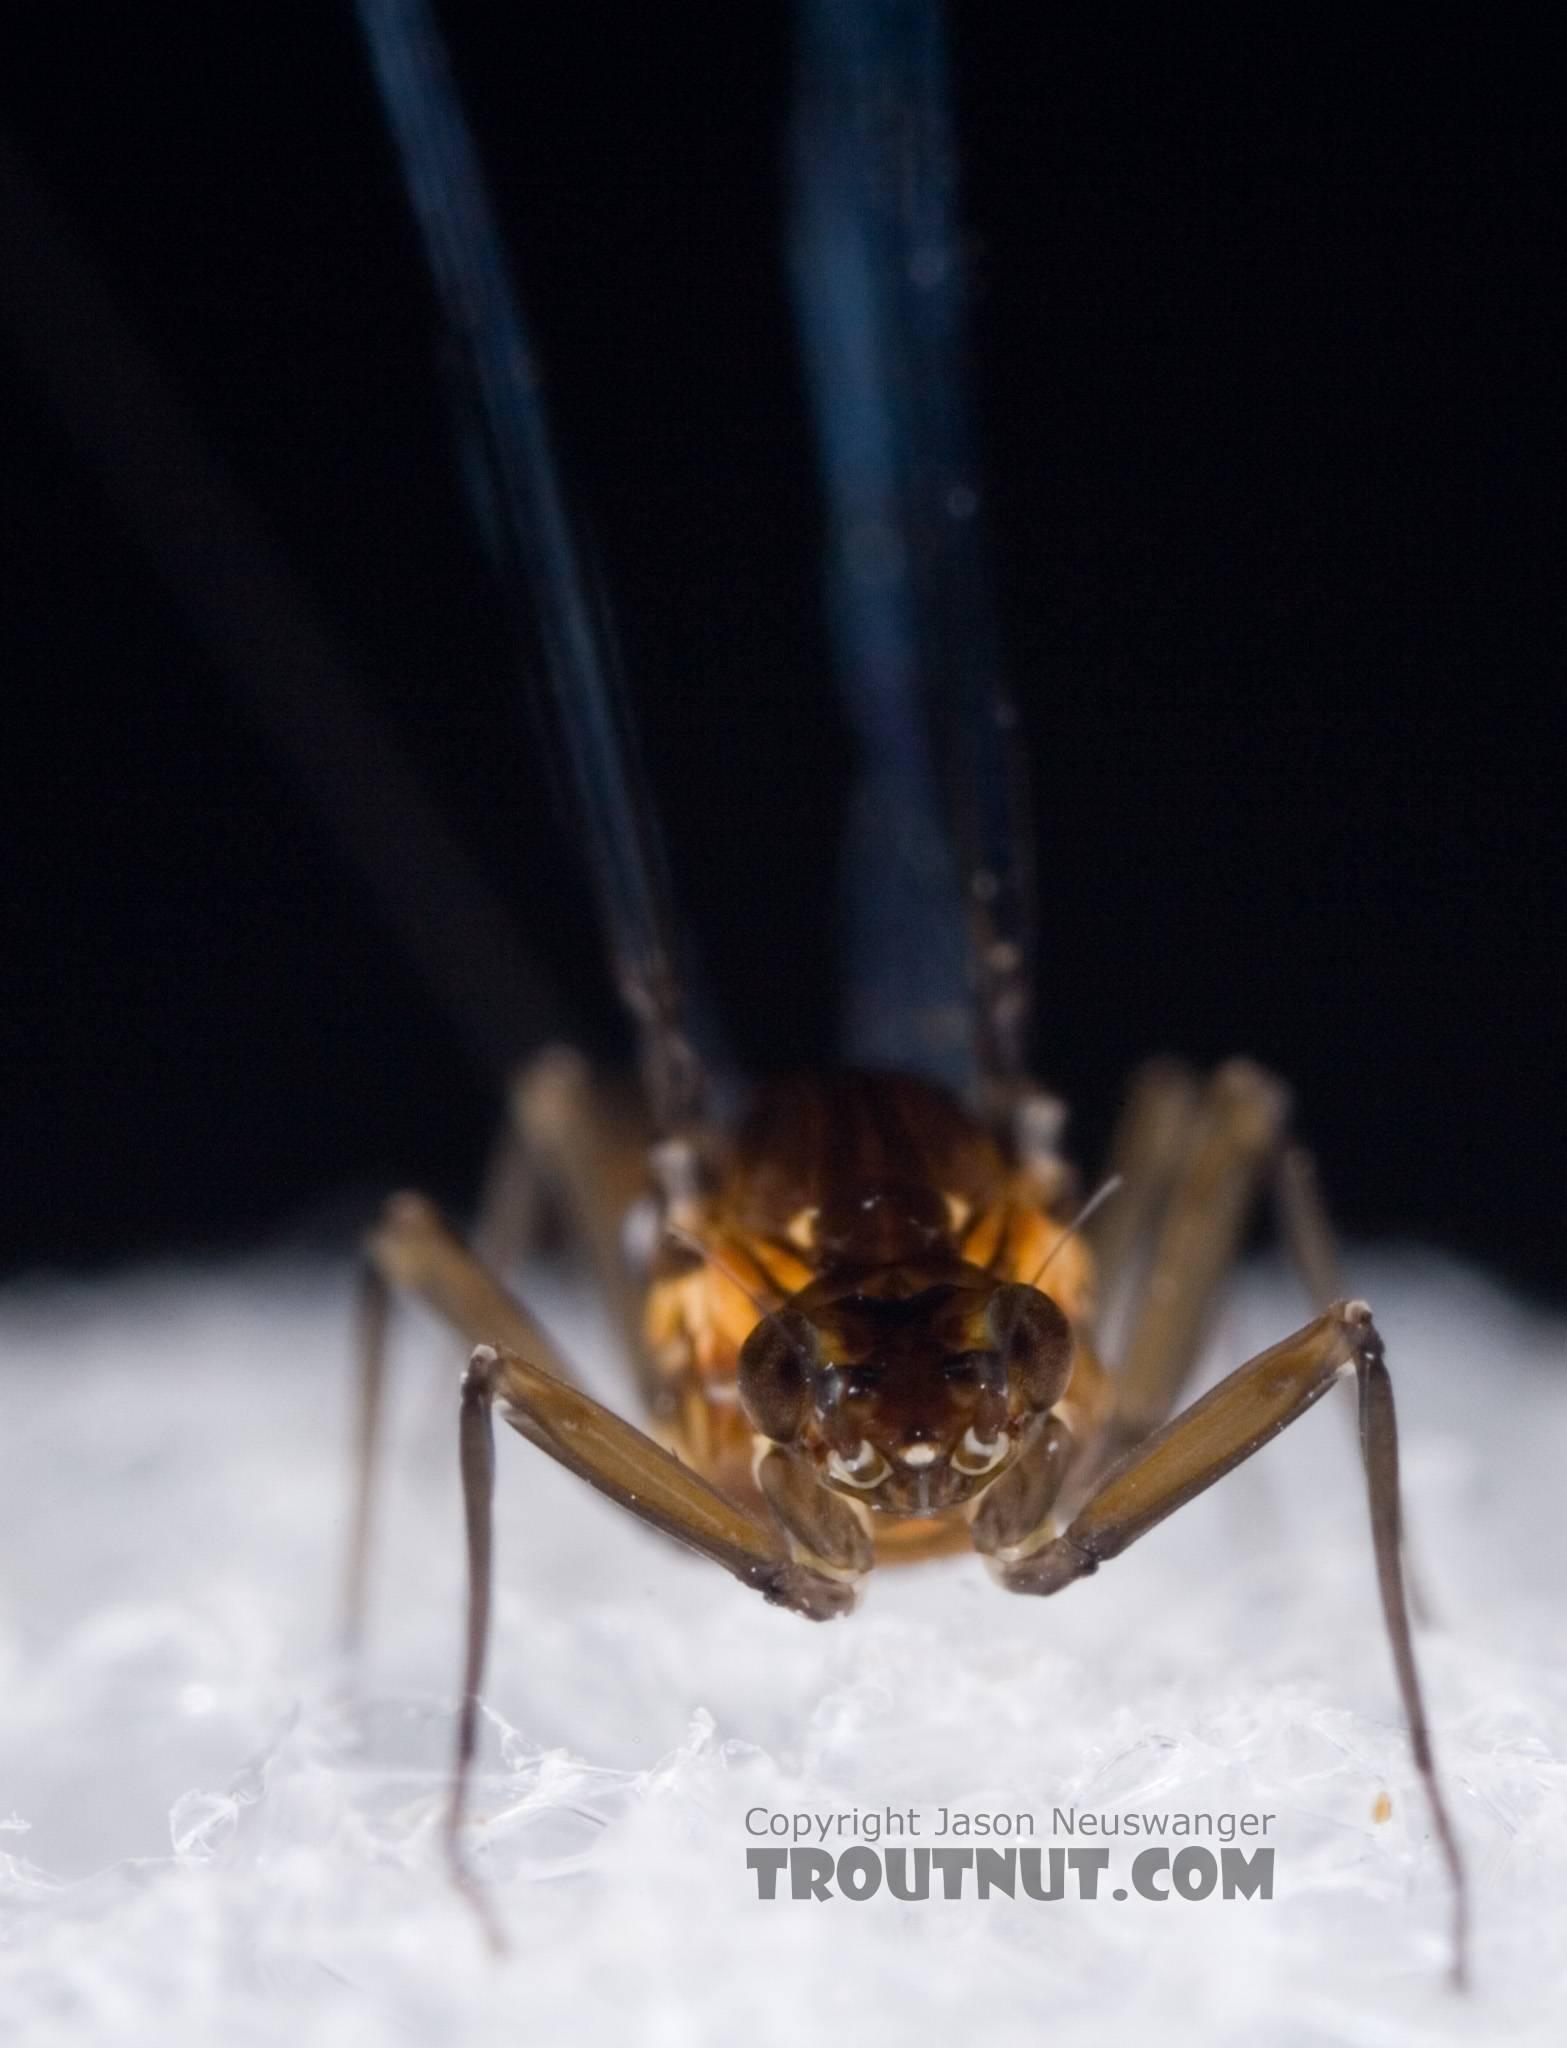 Female Baetidae (Blue-Winged Olives) Mayfly Spinner from Dresserville Creek in New York